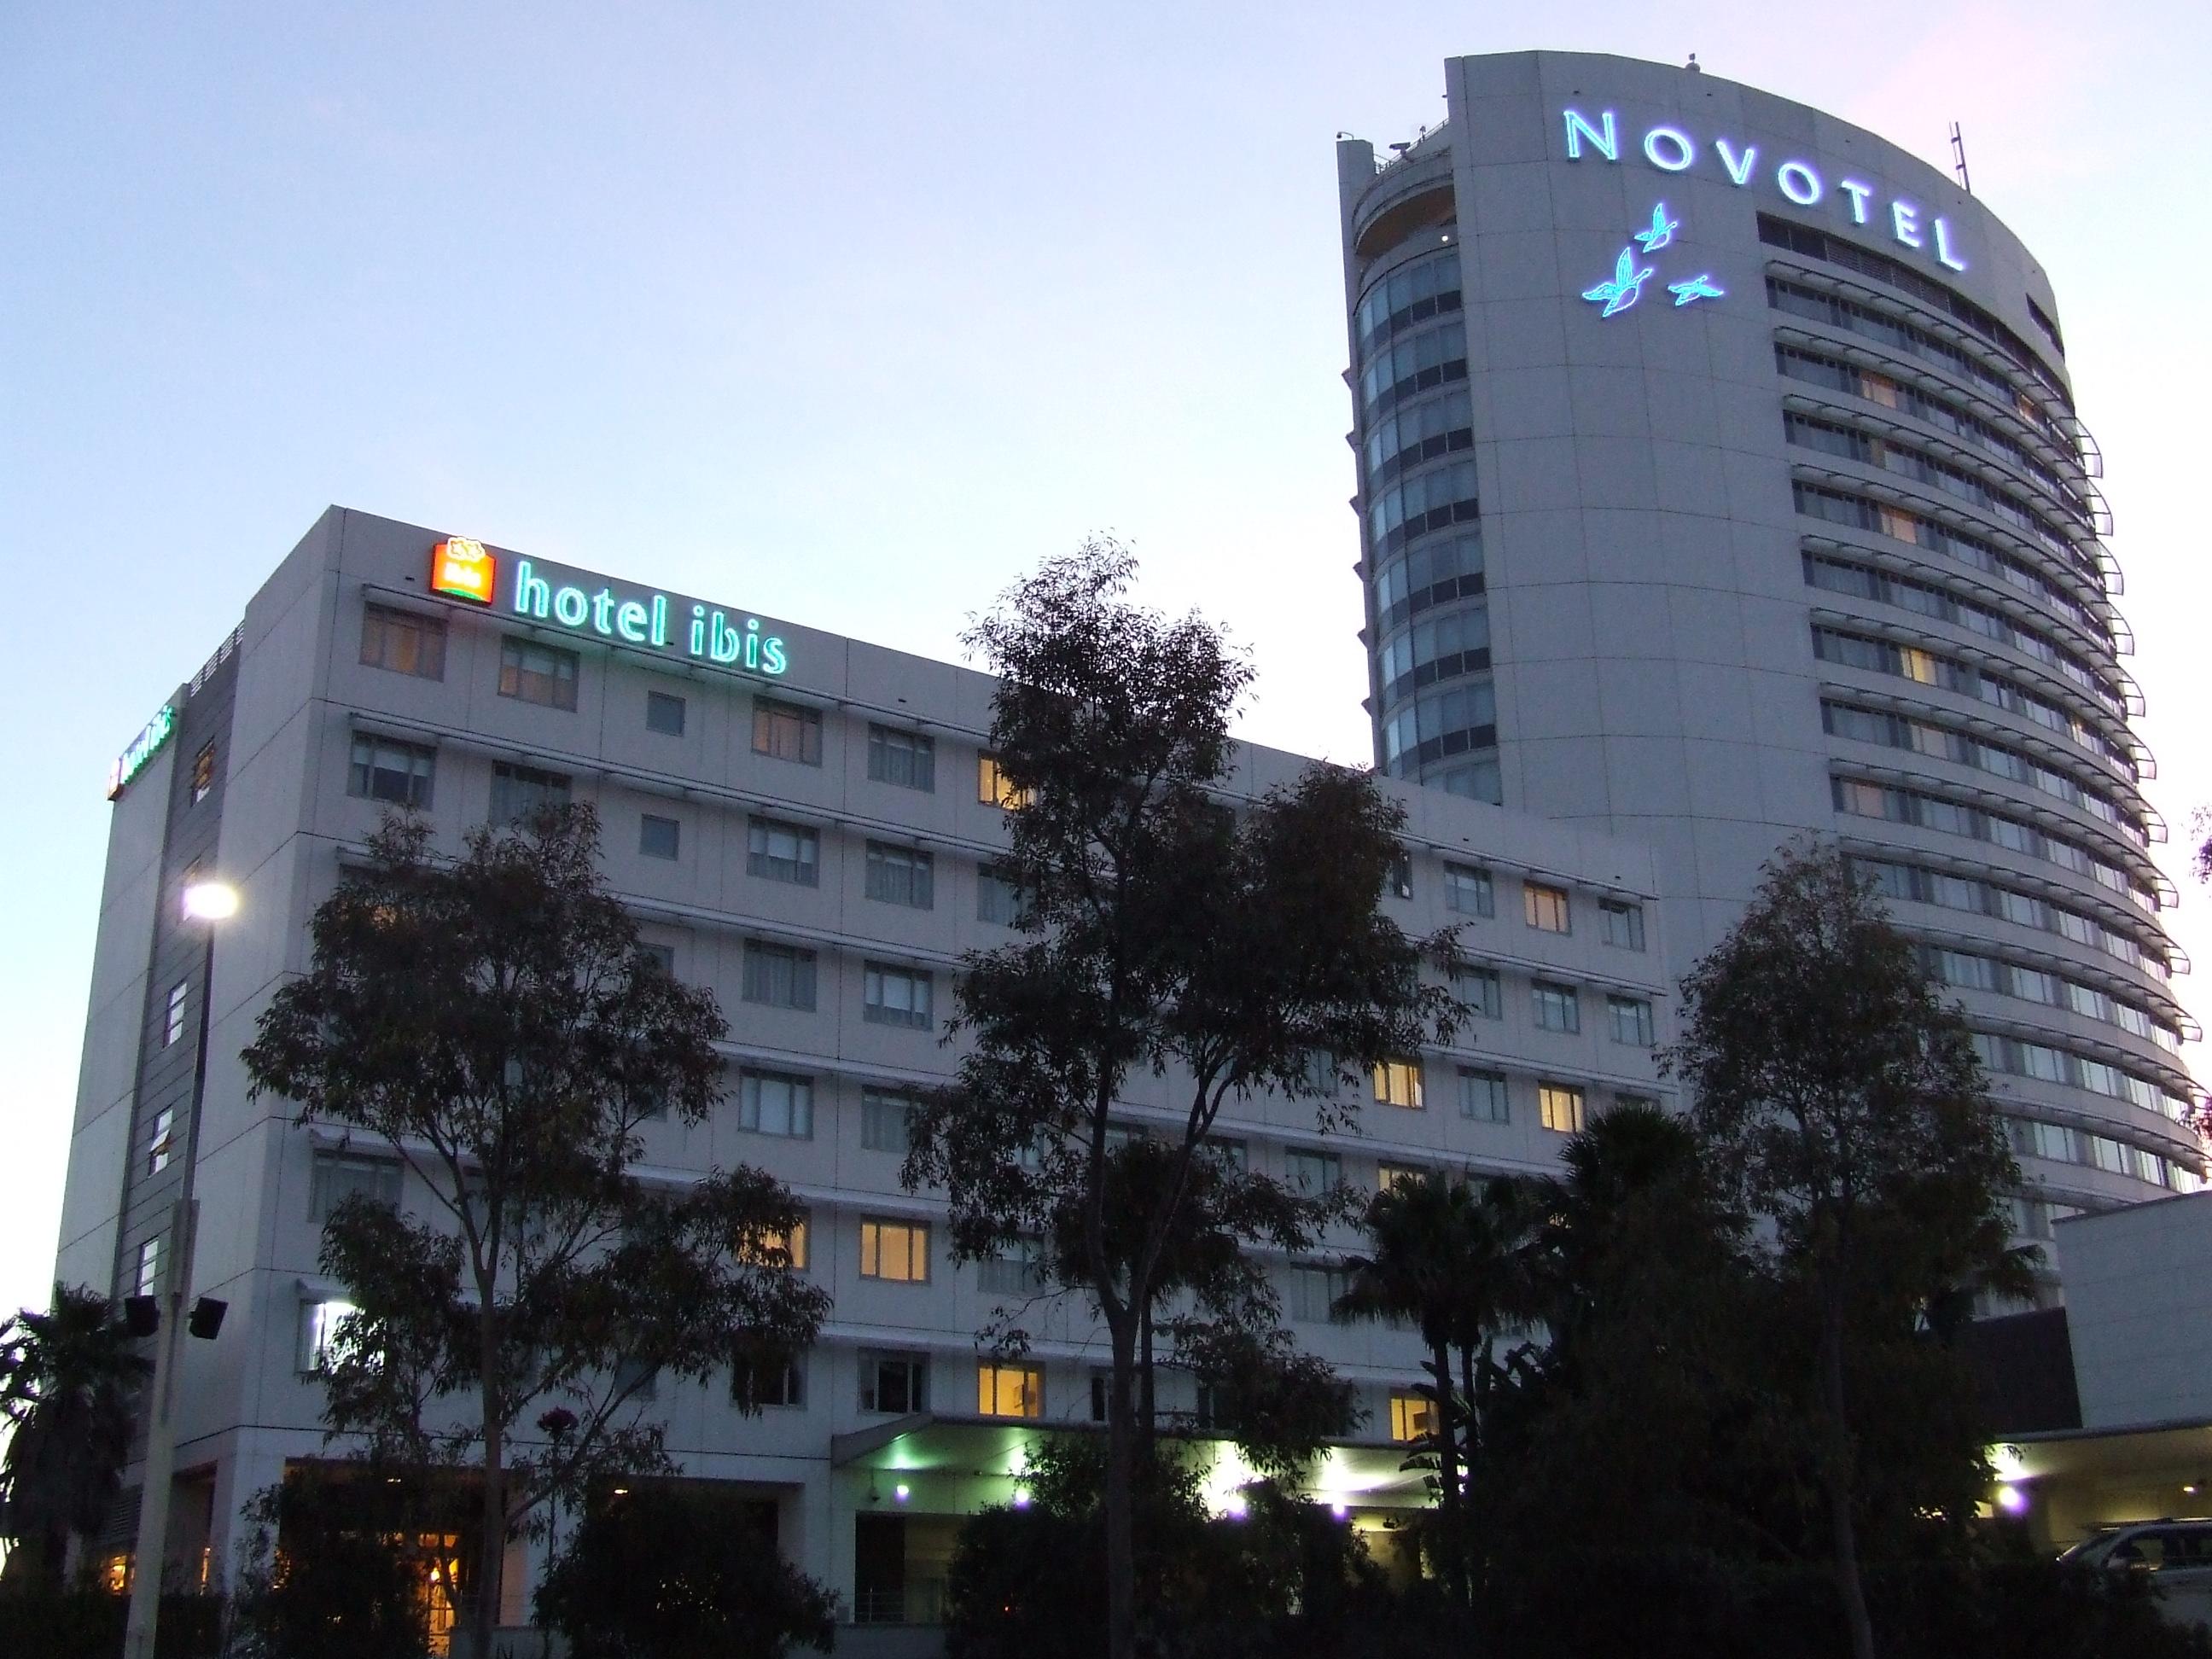 Sydney Park, Sleep & Fly Airport Hotel Deals